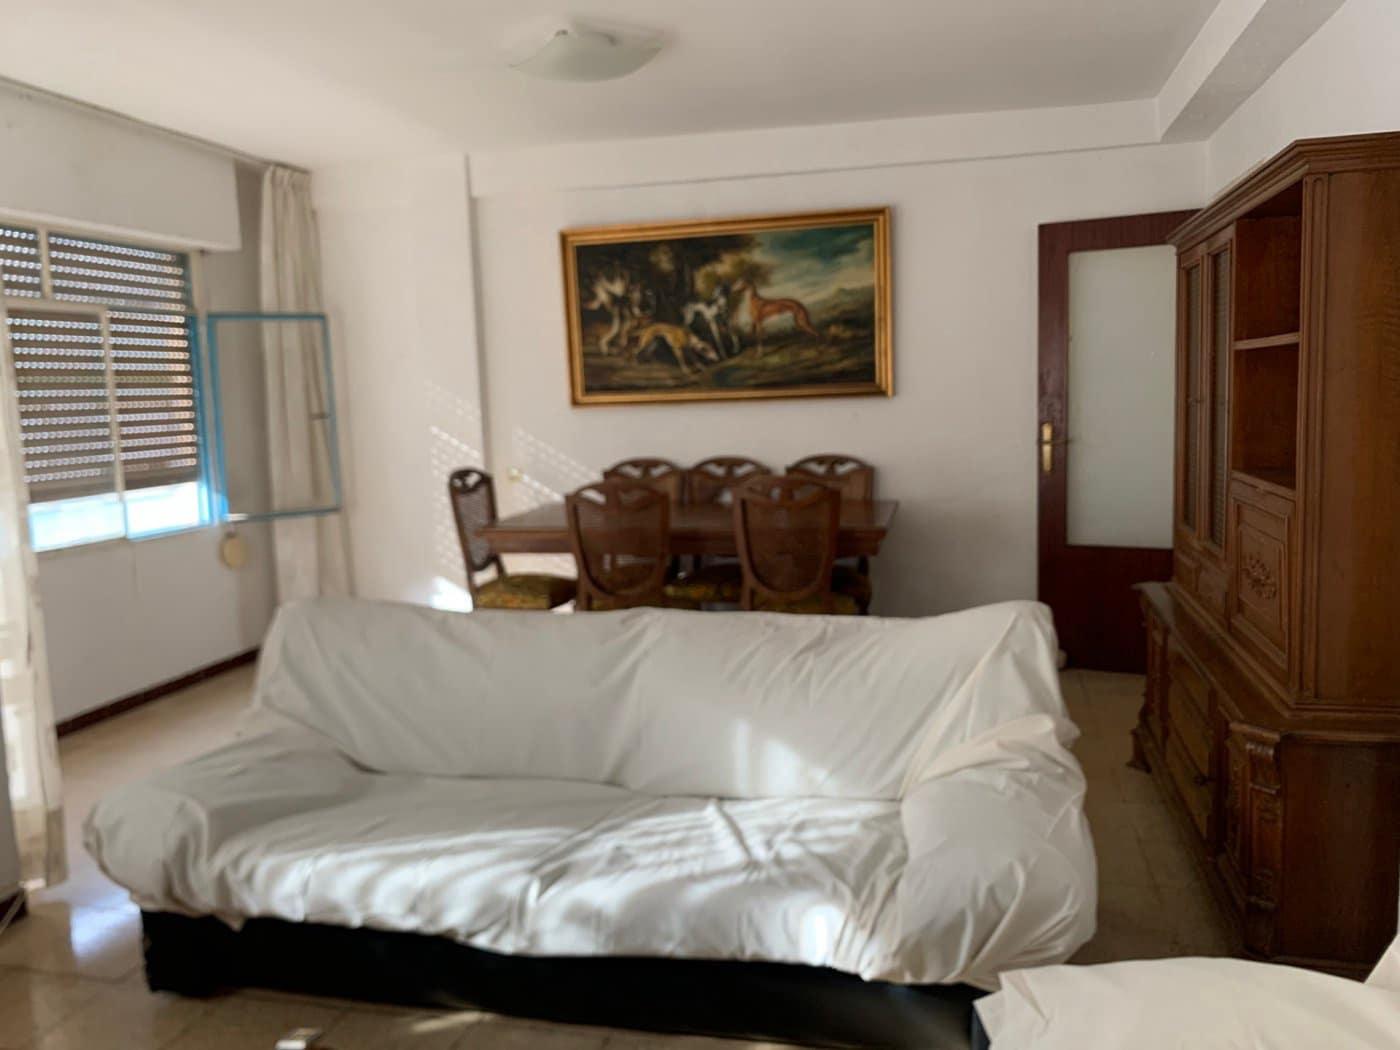 3 bedroom Flat for sale in Vinaros - € 47,000 (Ref: 6192234)